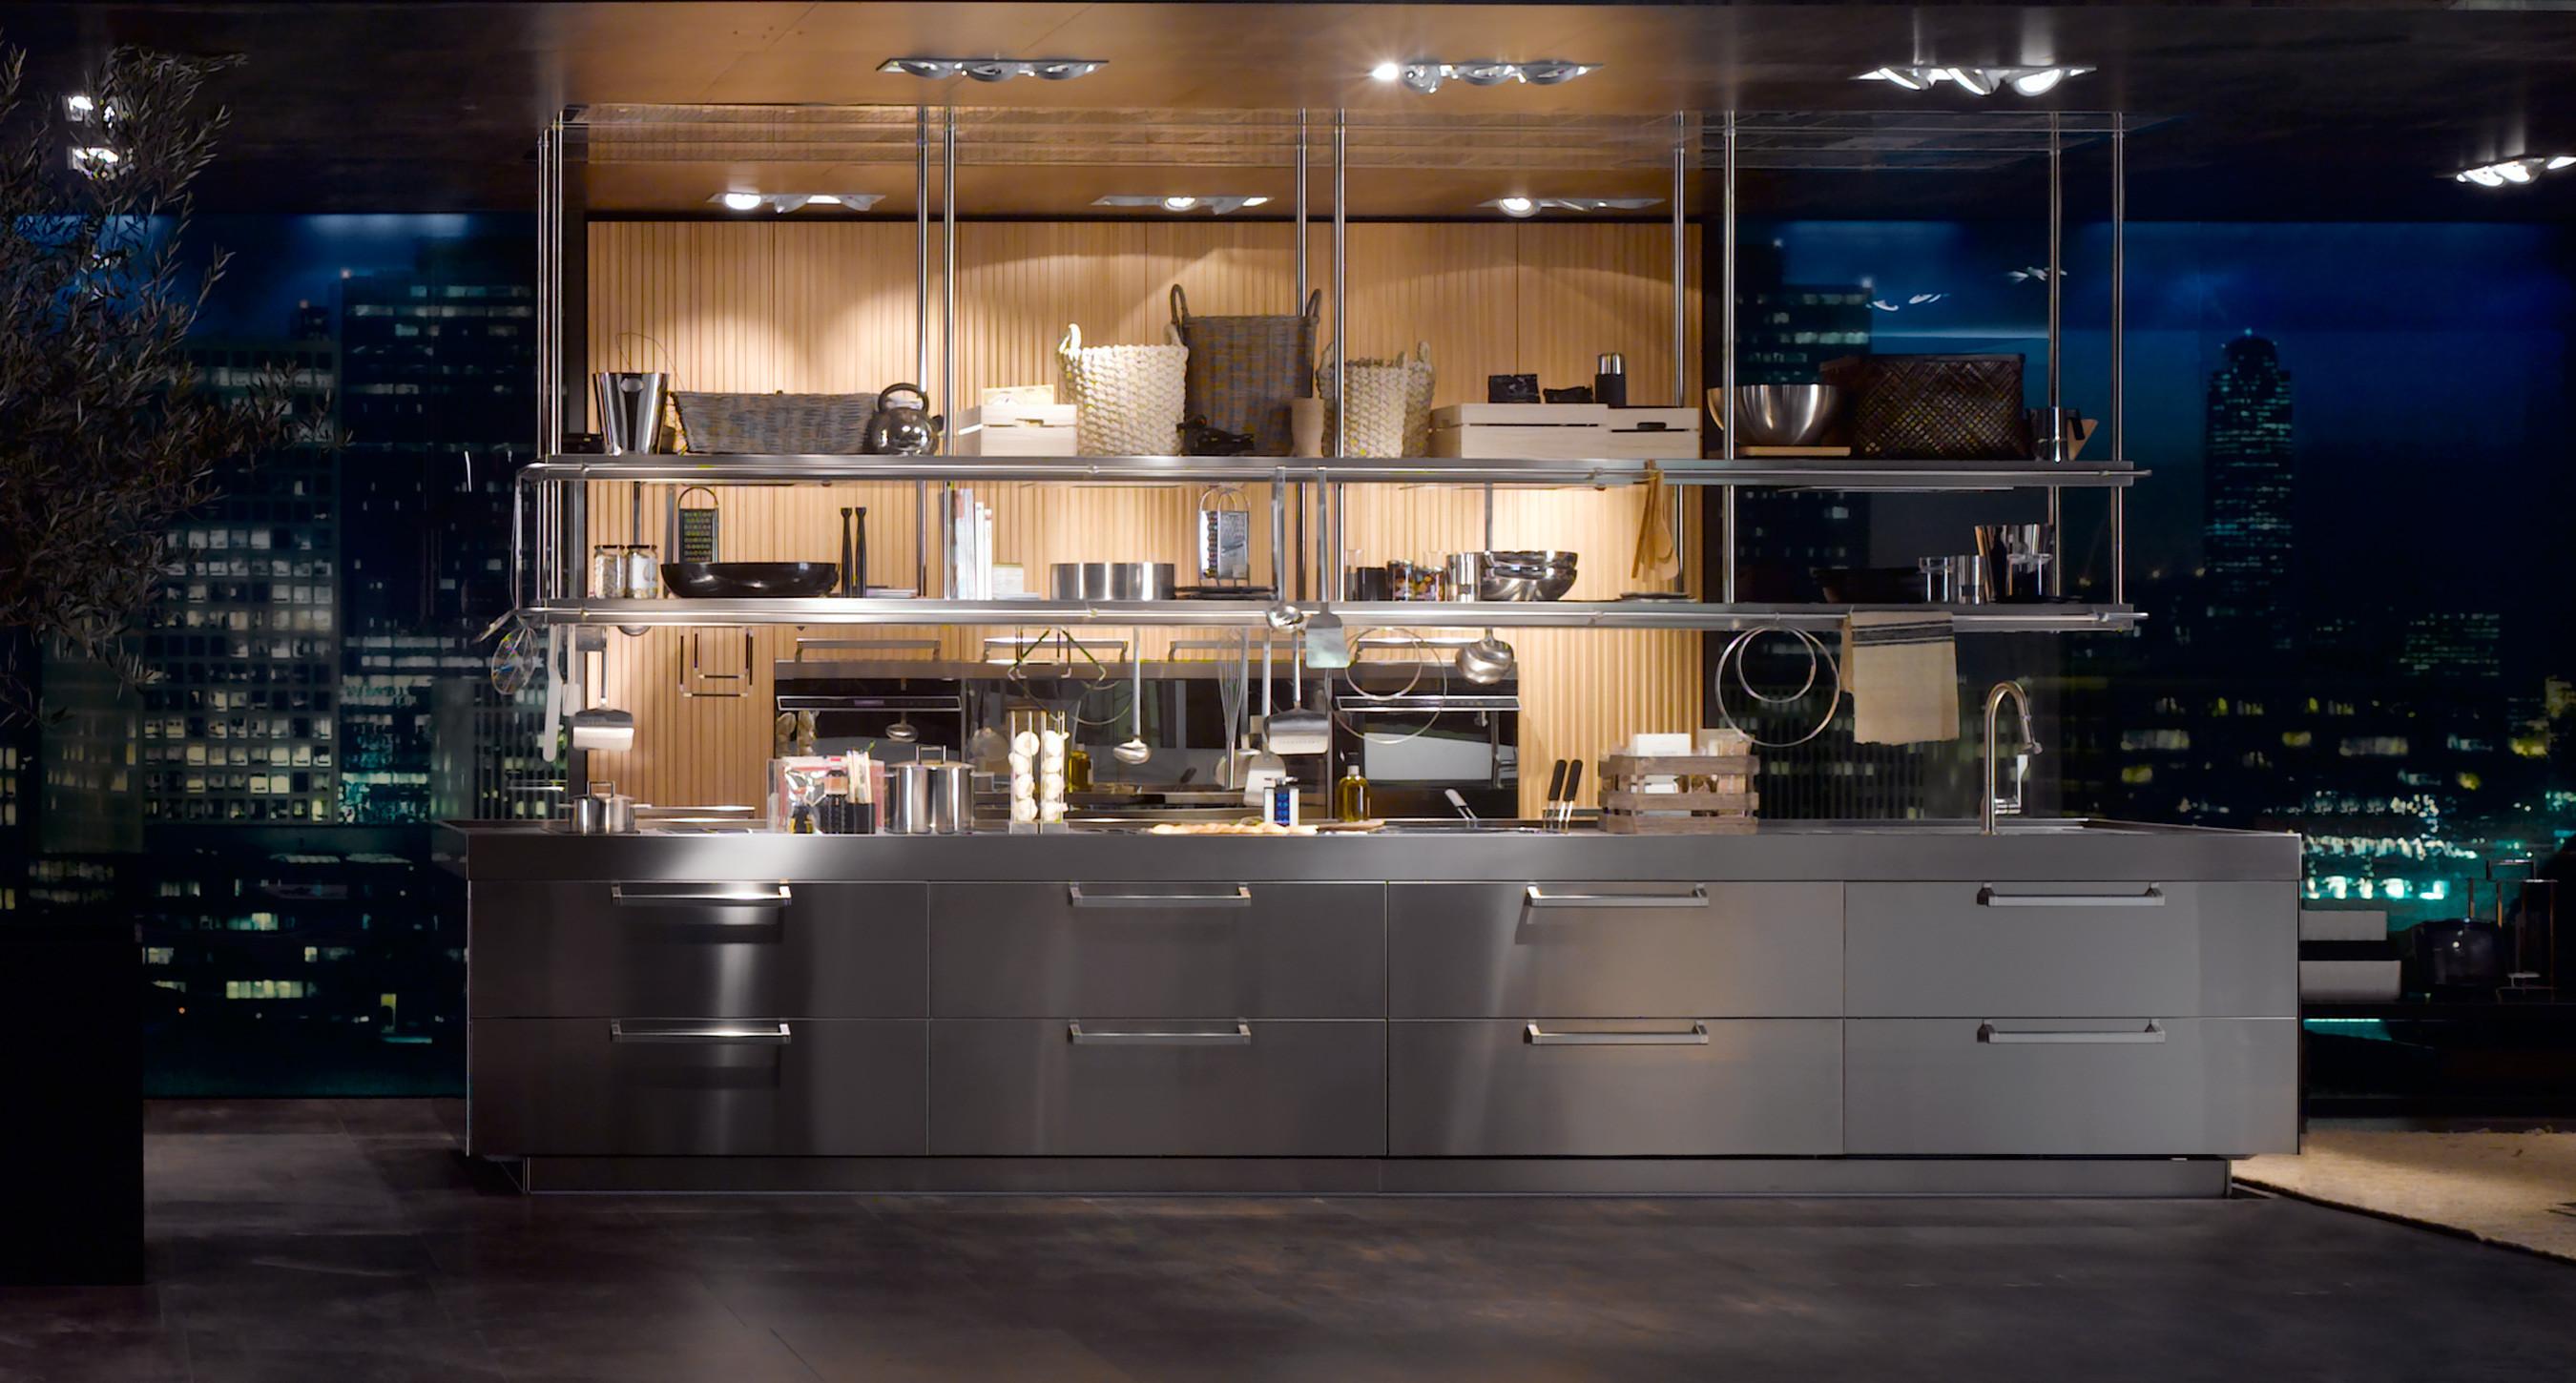 arclinea convivium arclinea conceptstore. Black Bedroom Furniture Sets. Home Design Ideas